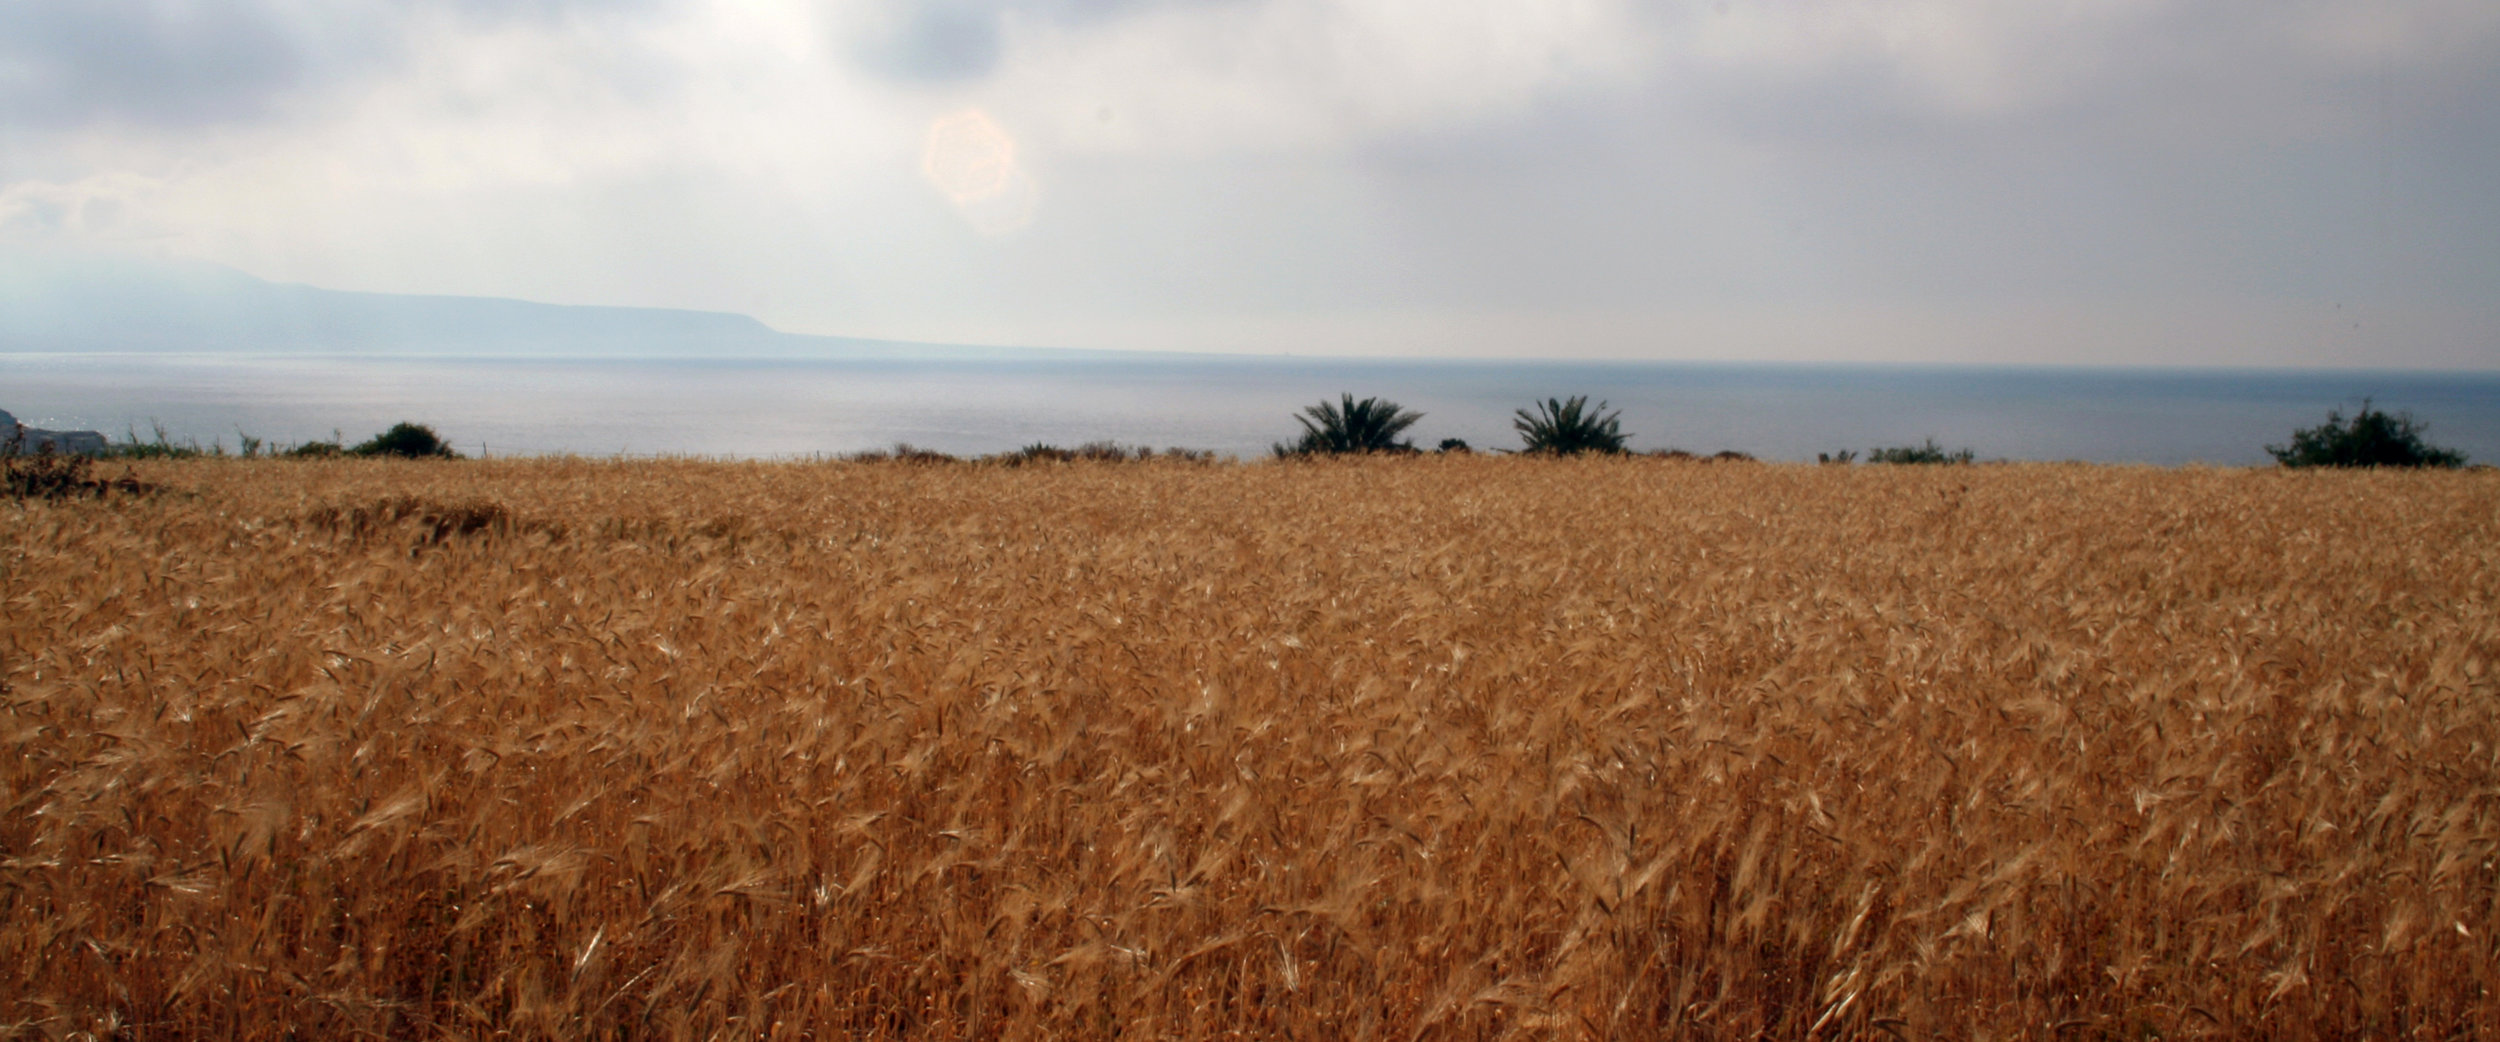 Jebel akhdar, libya (photo: Giulio lucarini)